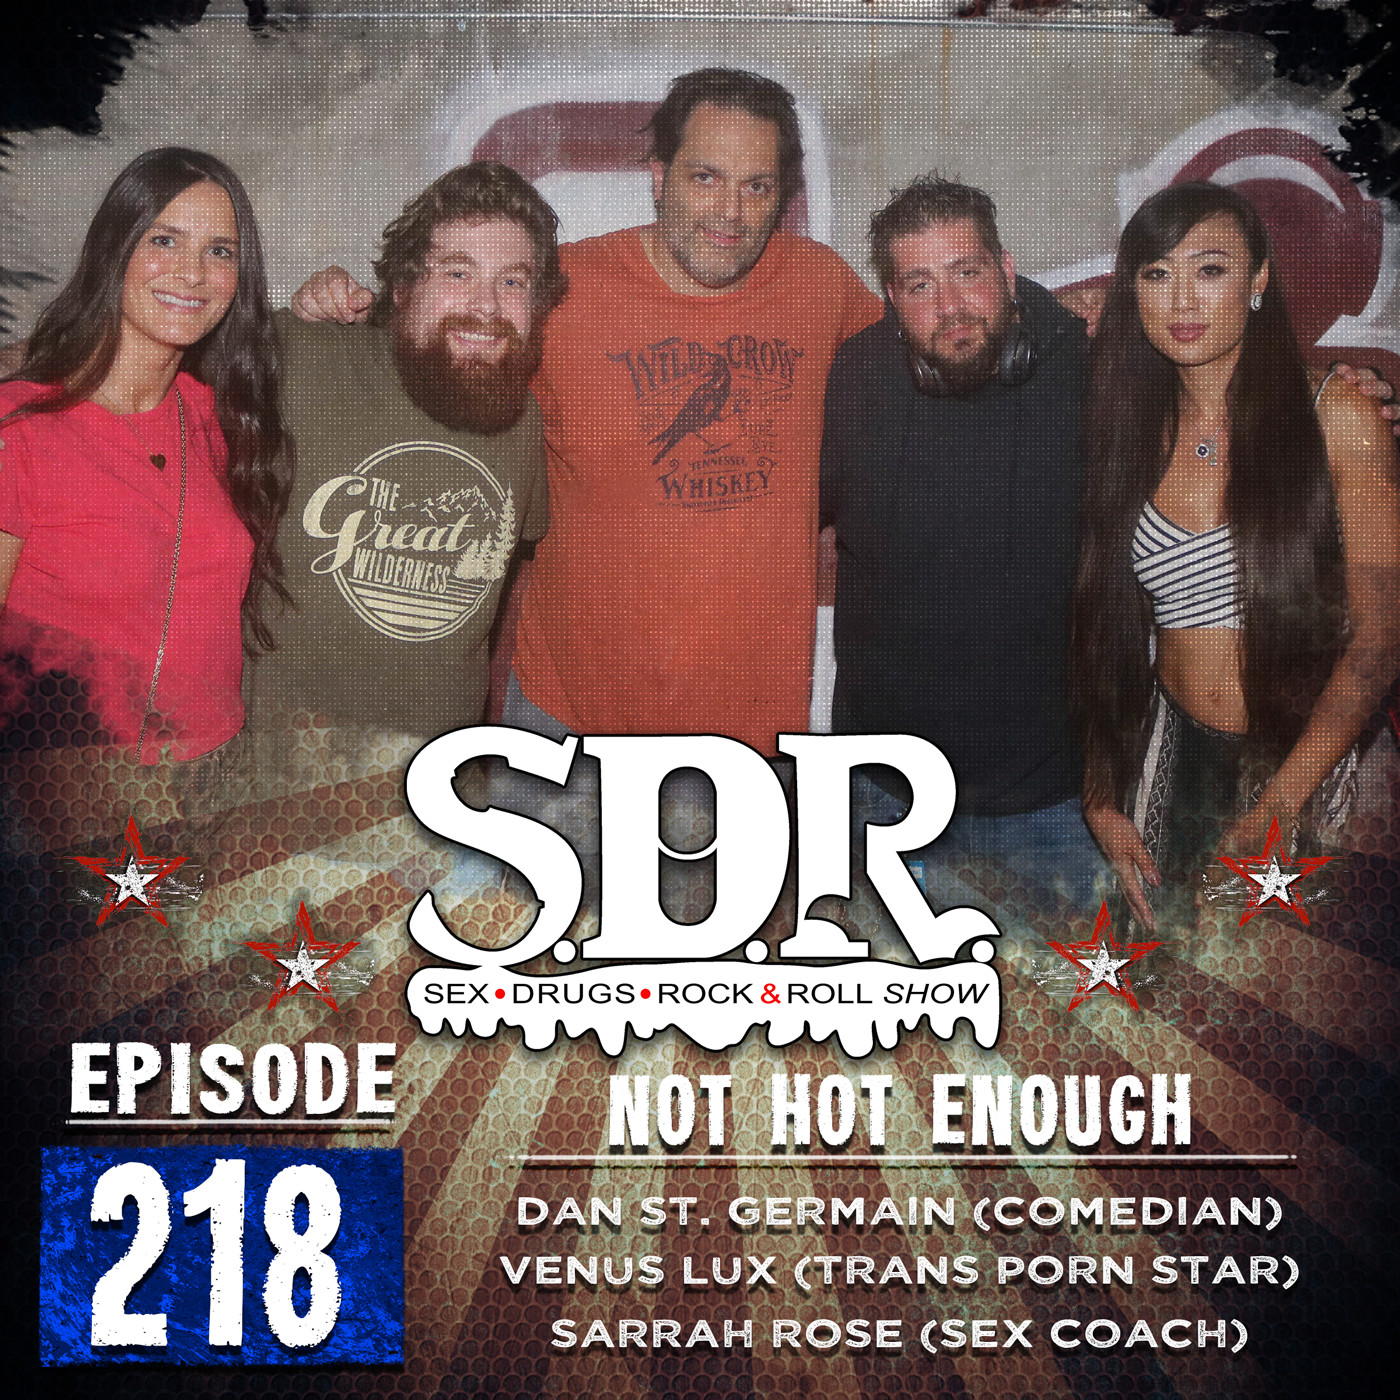 Dan St.Germain, Venus Lux & Sarrah Rose (Comedian, Trans Pornstar & Sex Coach) - Not Hot Enough